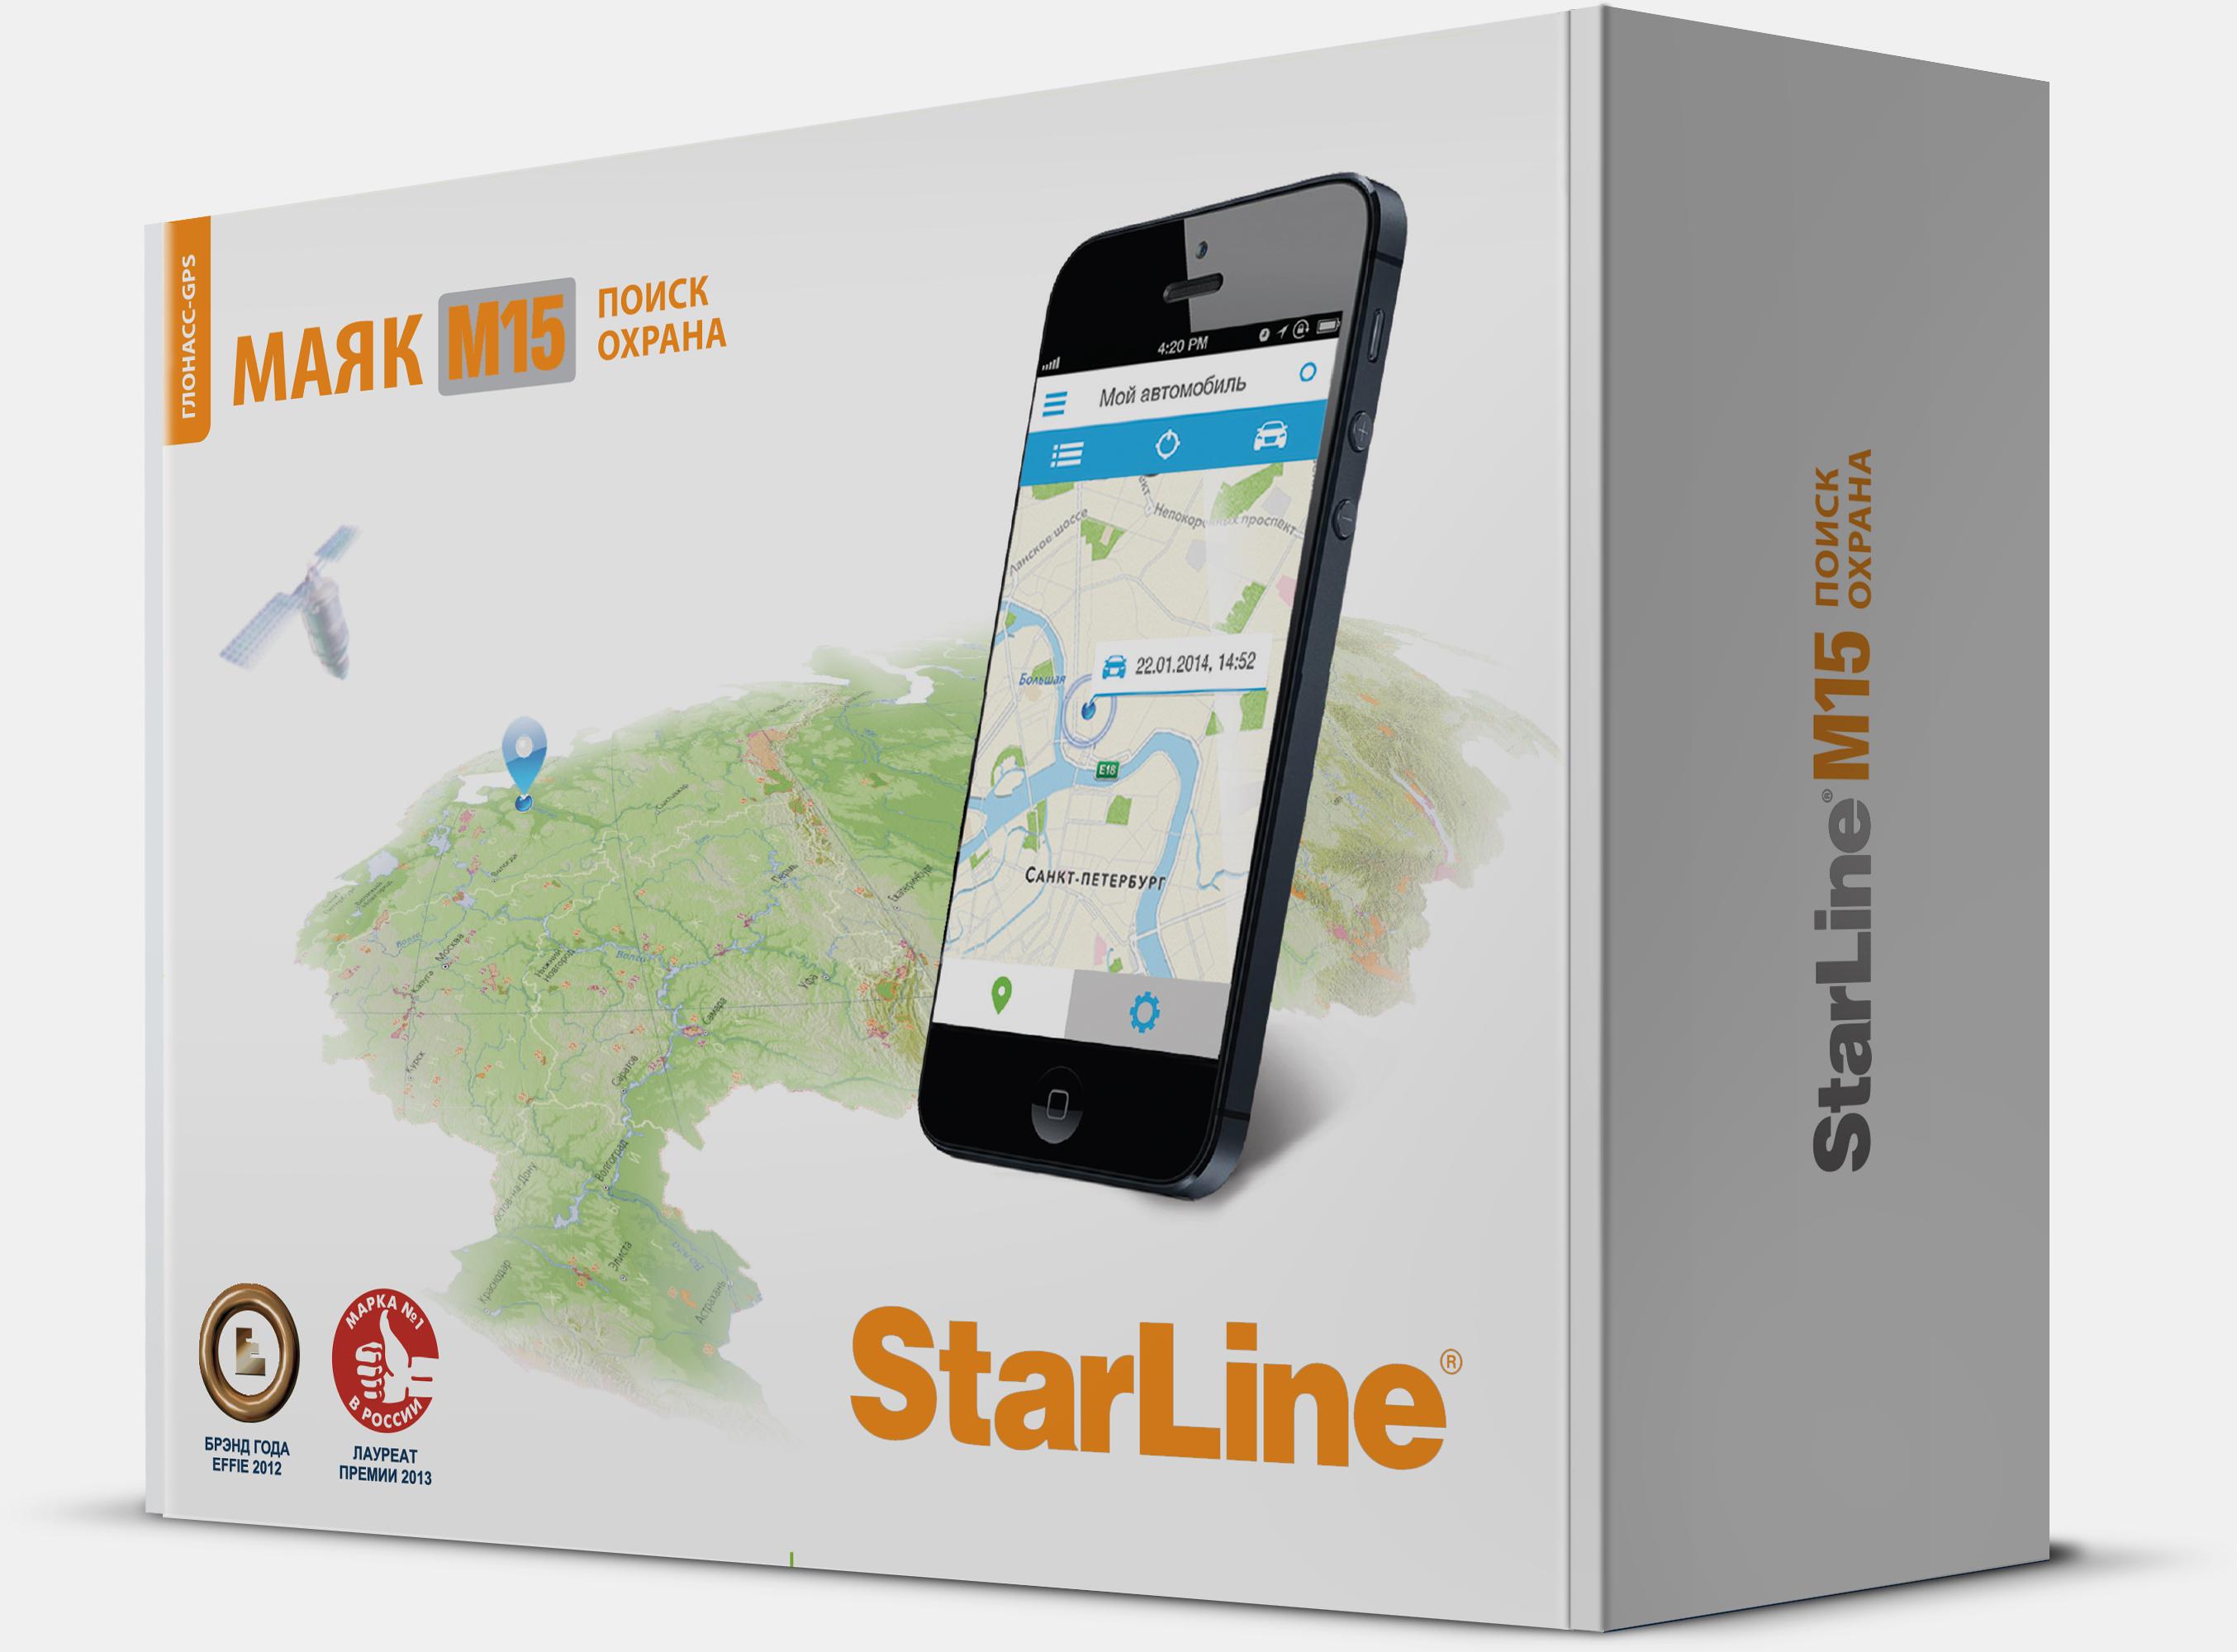 https://krasnoyarsk-starline.avto-guard.ru/wp-content/uploads/2017/09/Starline-M15.jpg 227x168